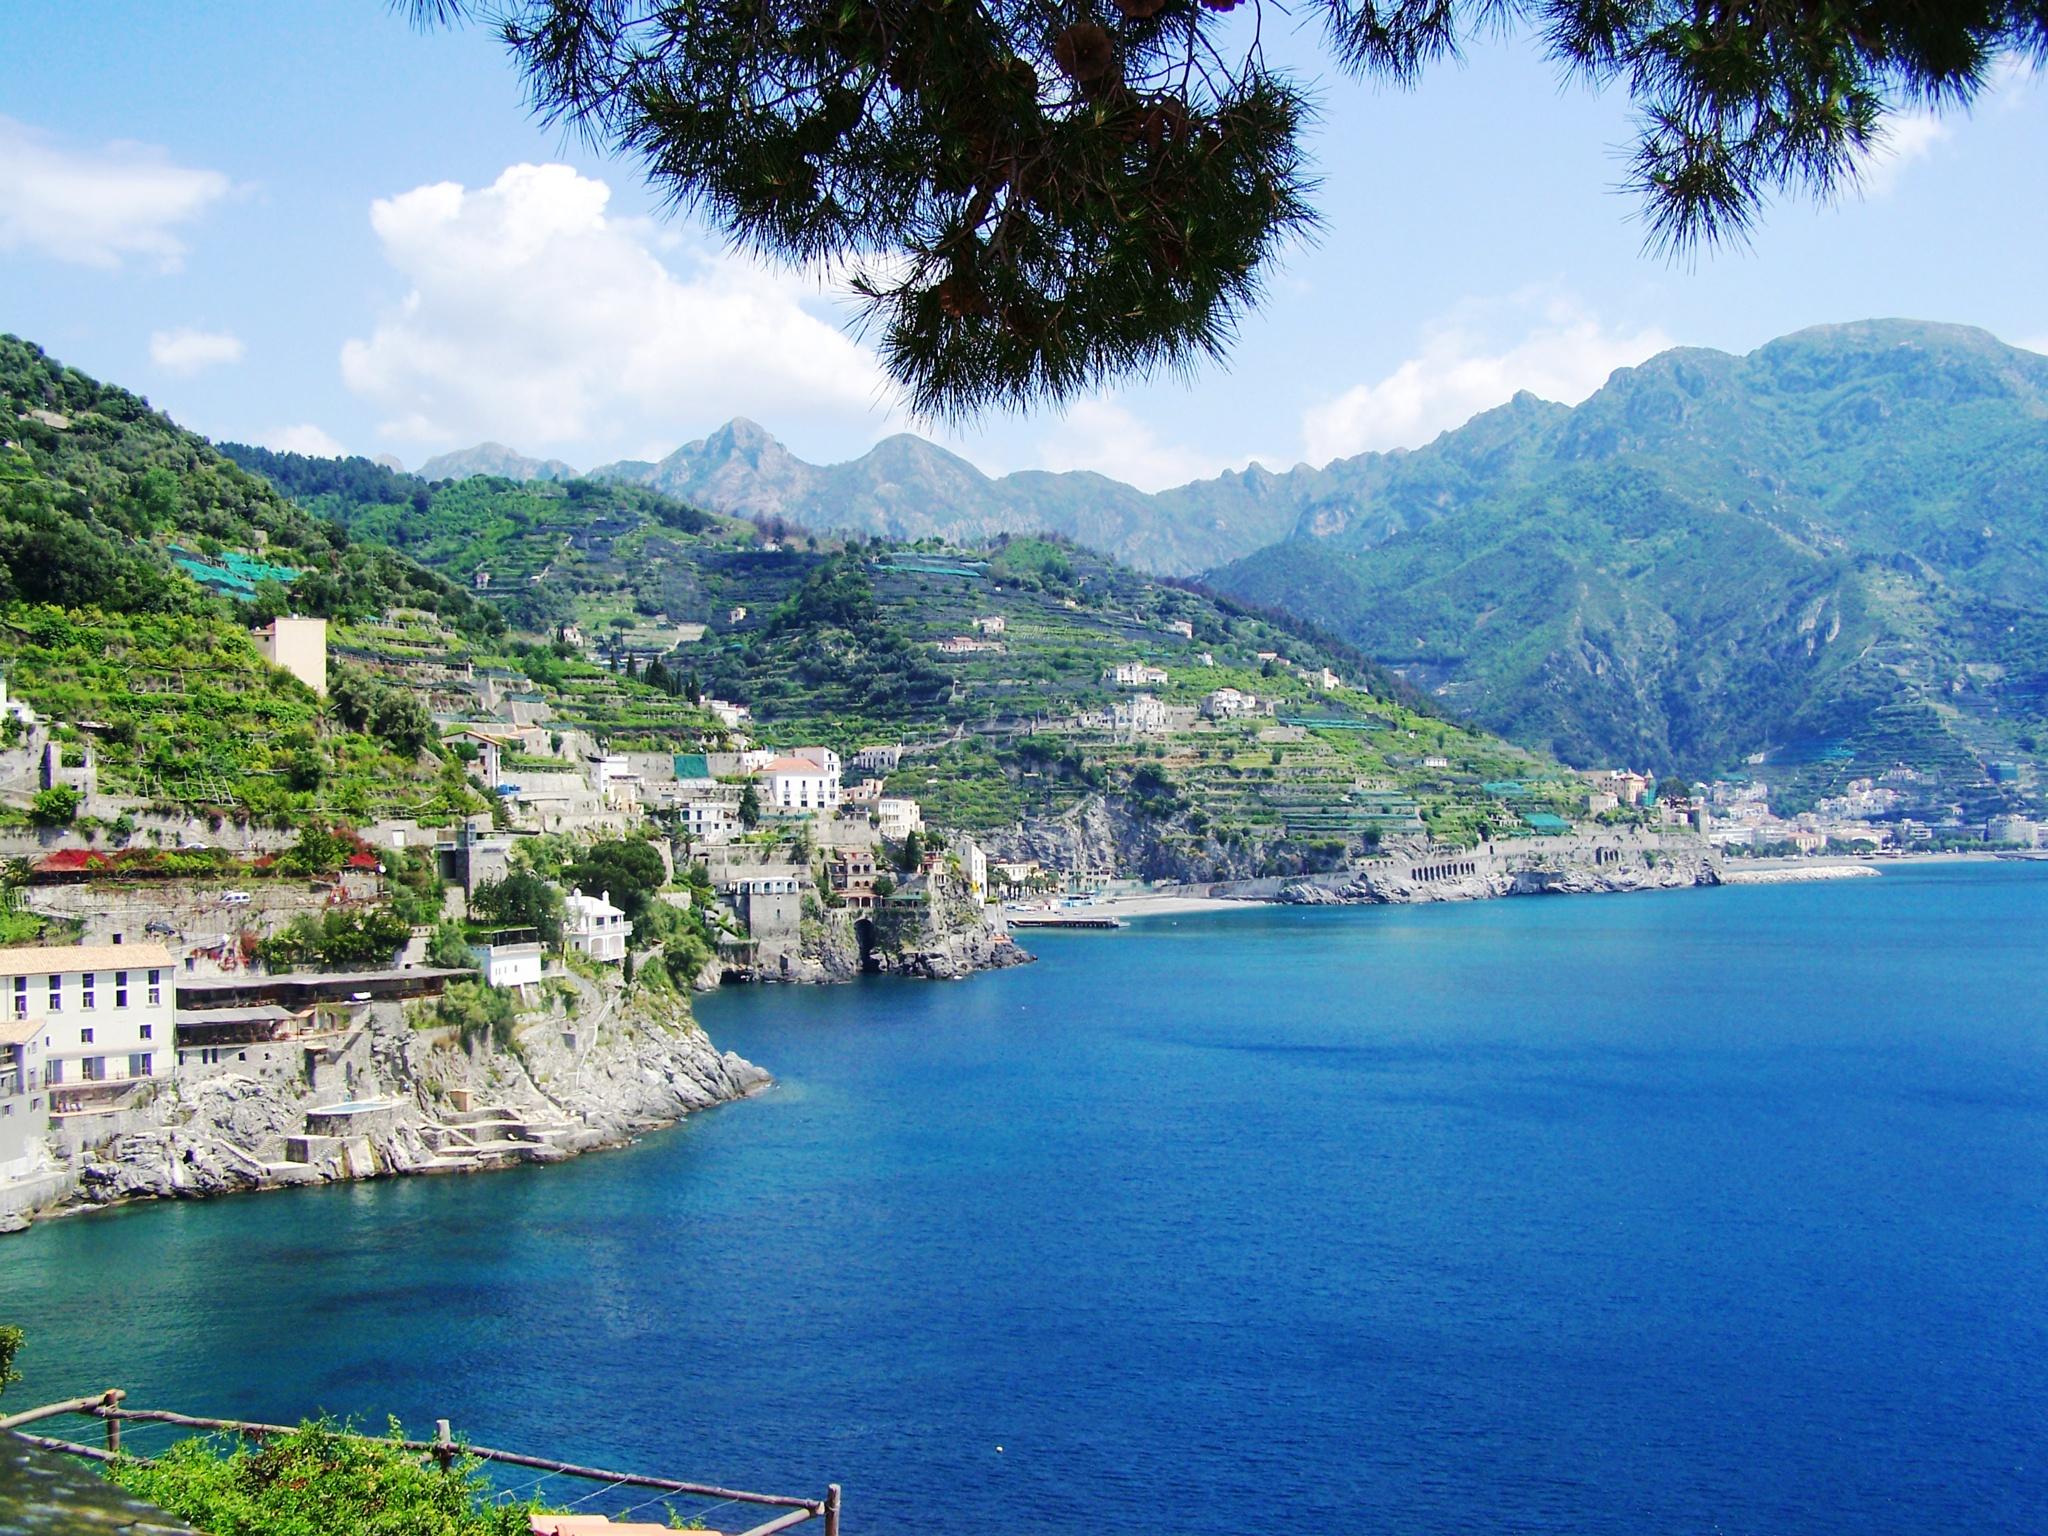 Minori, Italy by BendTheLens